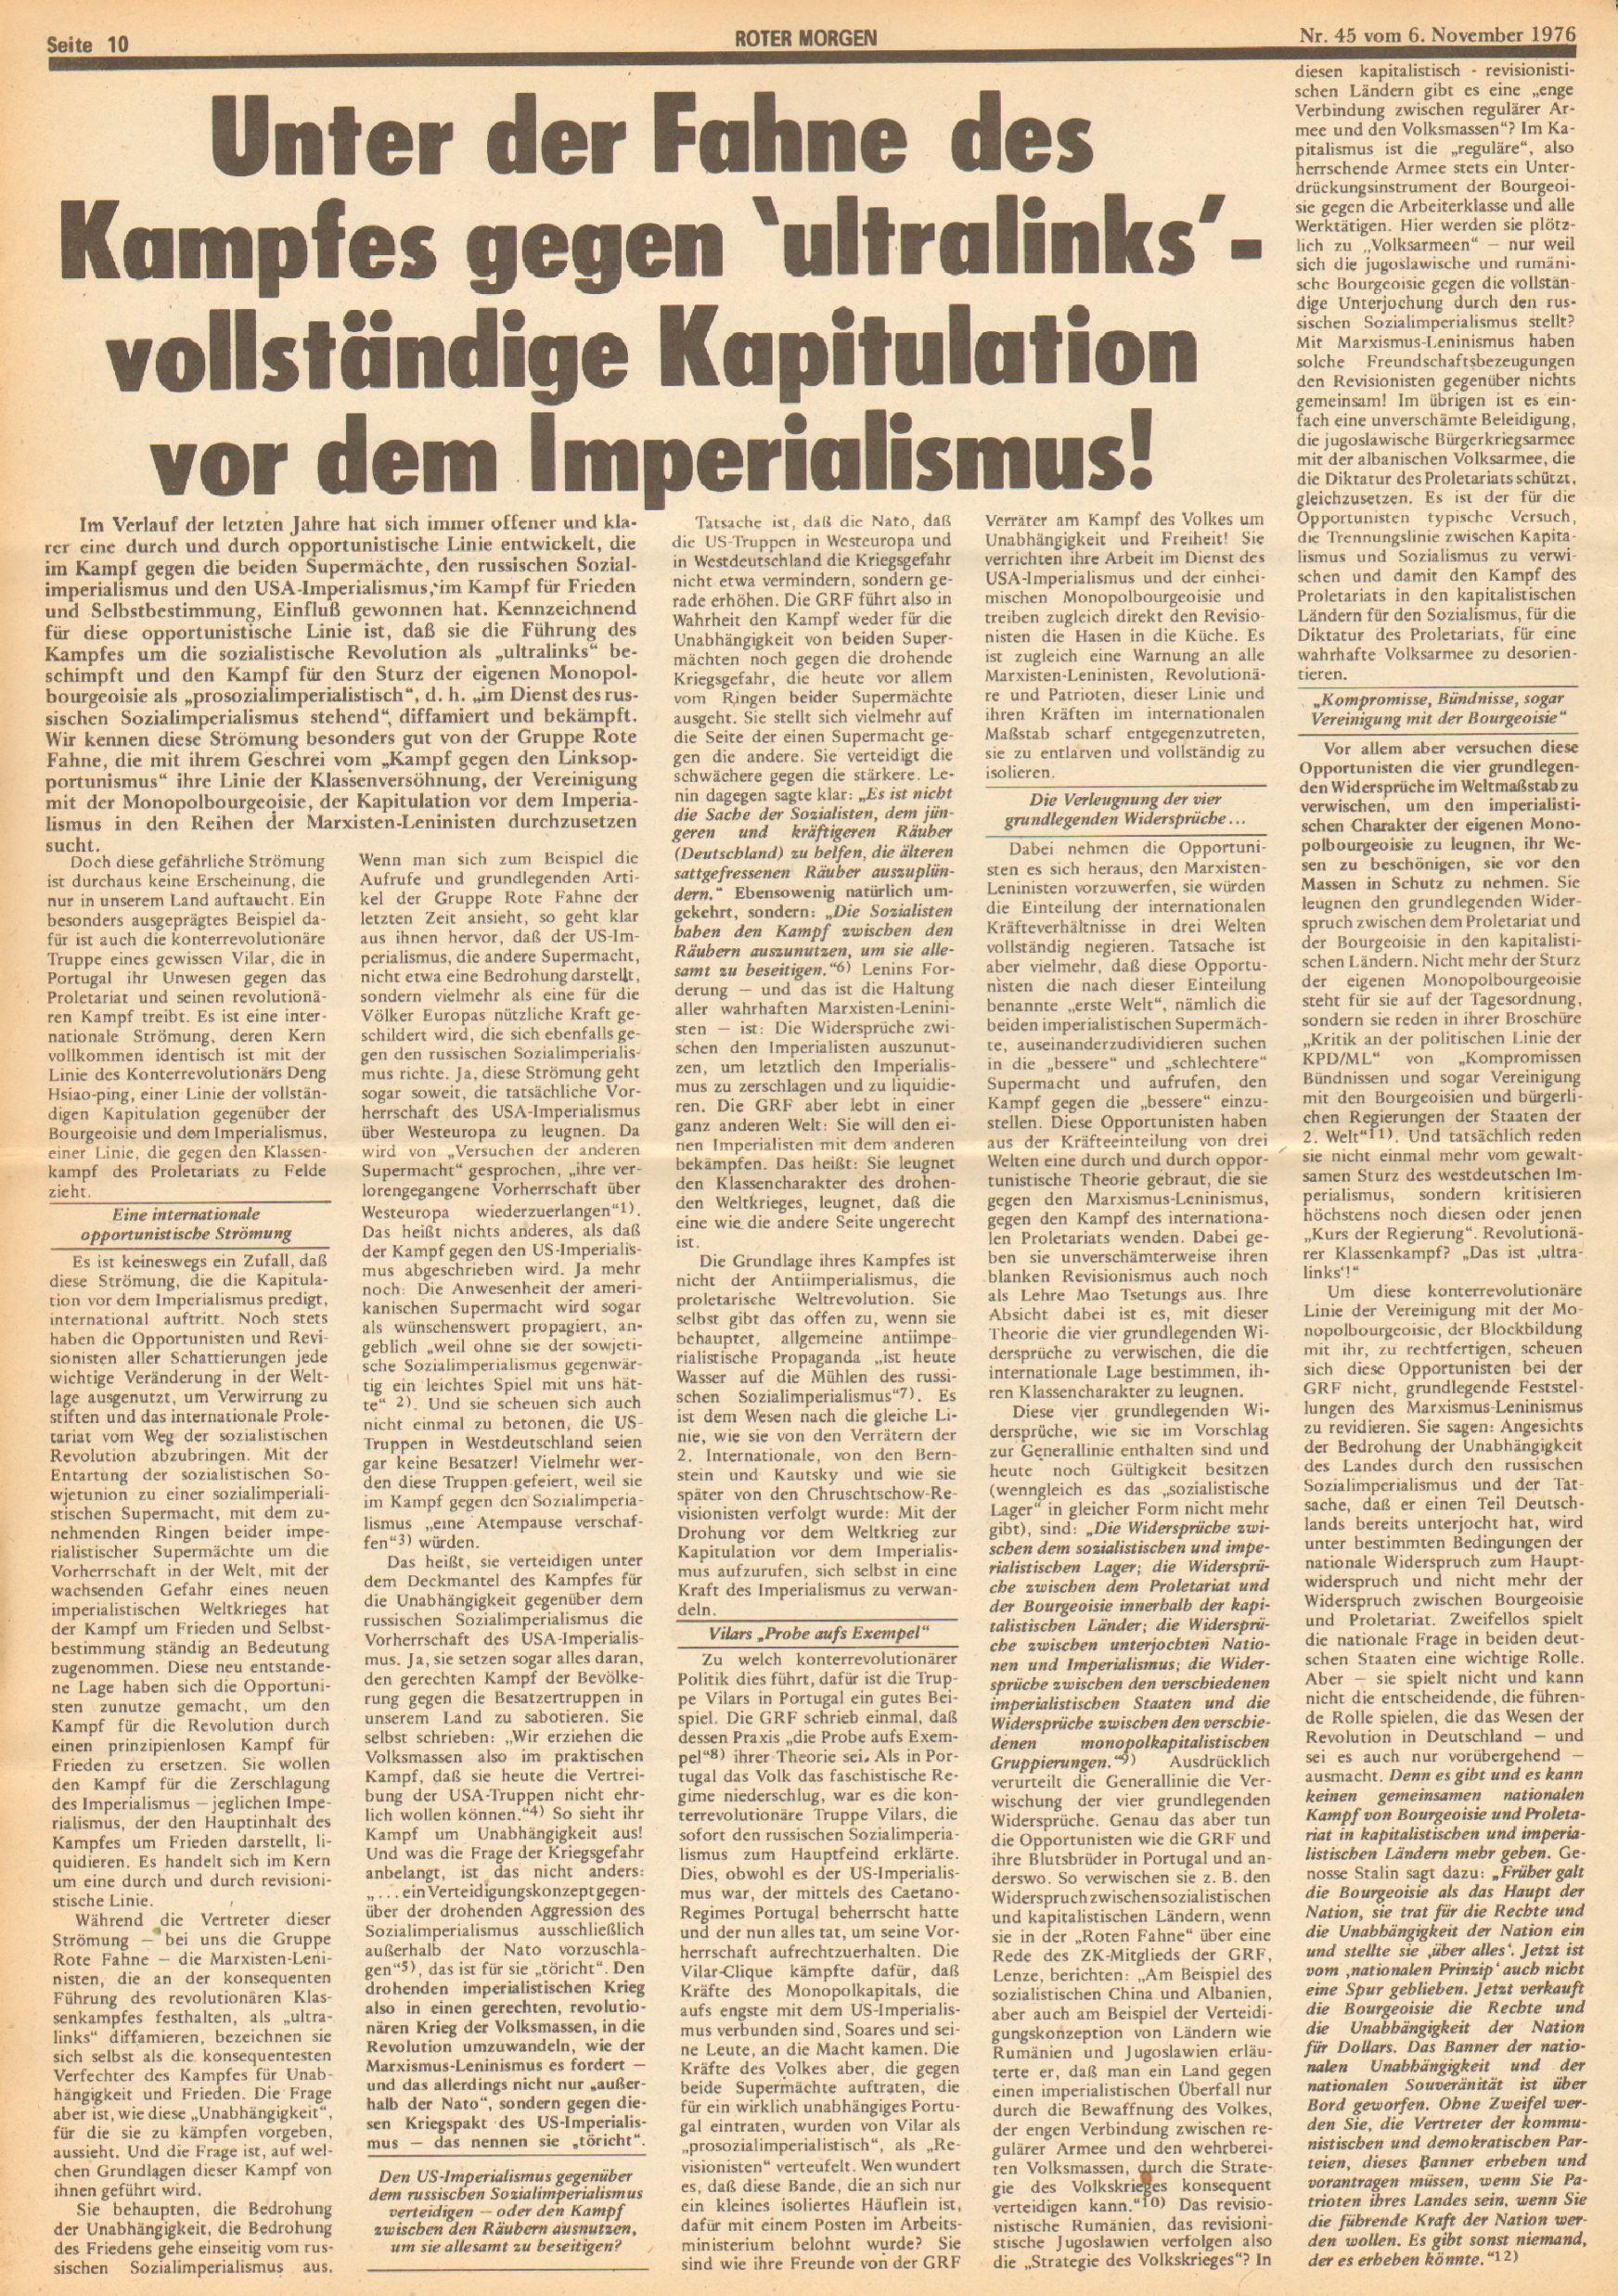 Roter Morgen, 10. Jg., 6. November 1976, Nr. 45, Seite 10